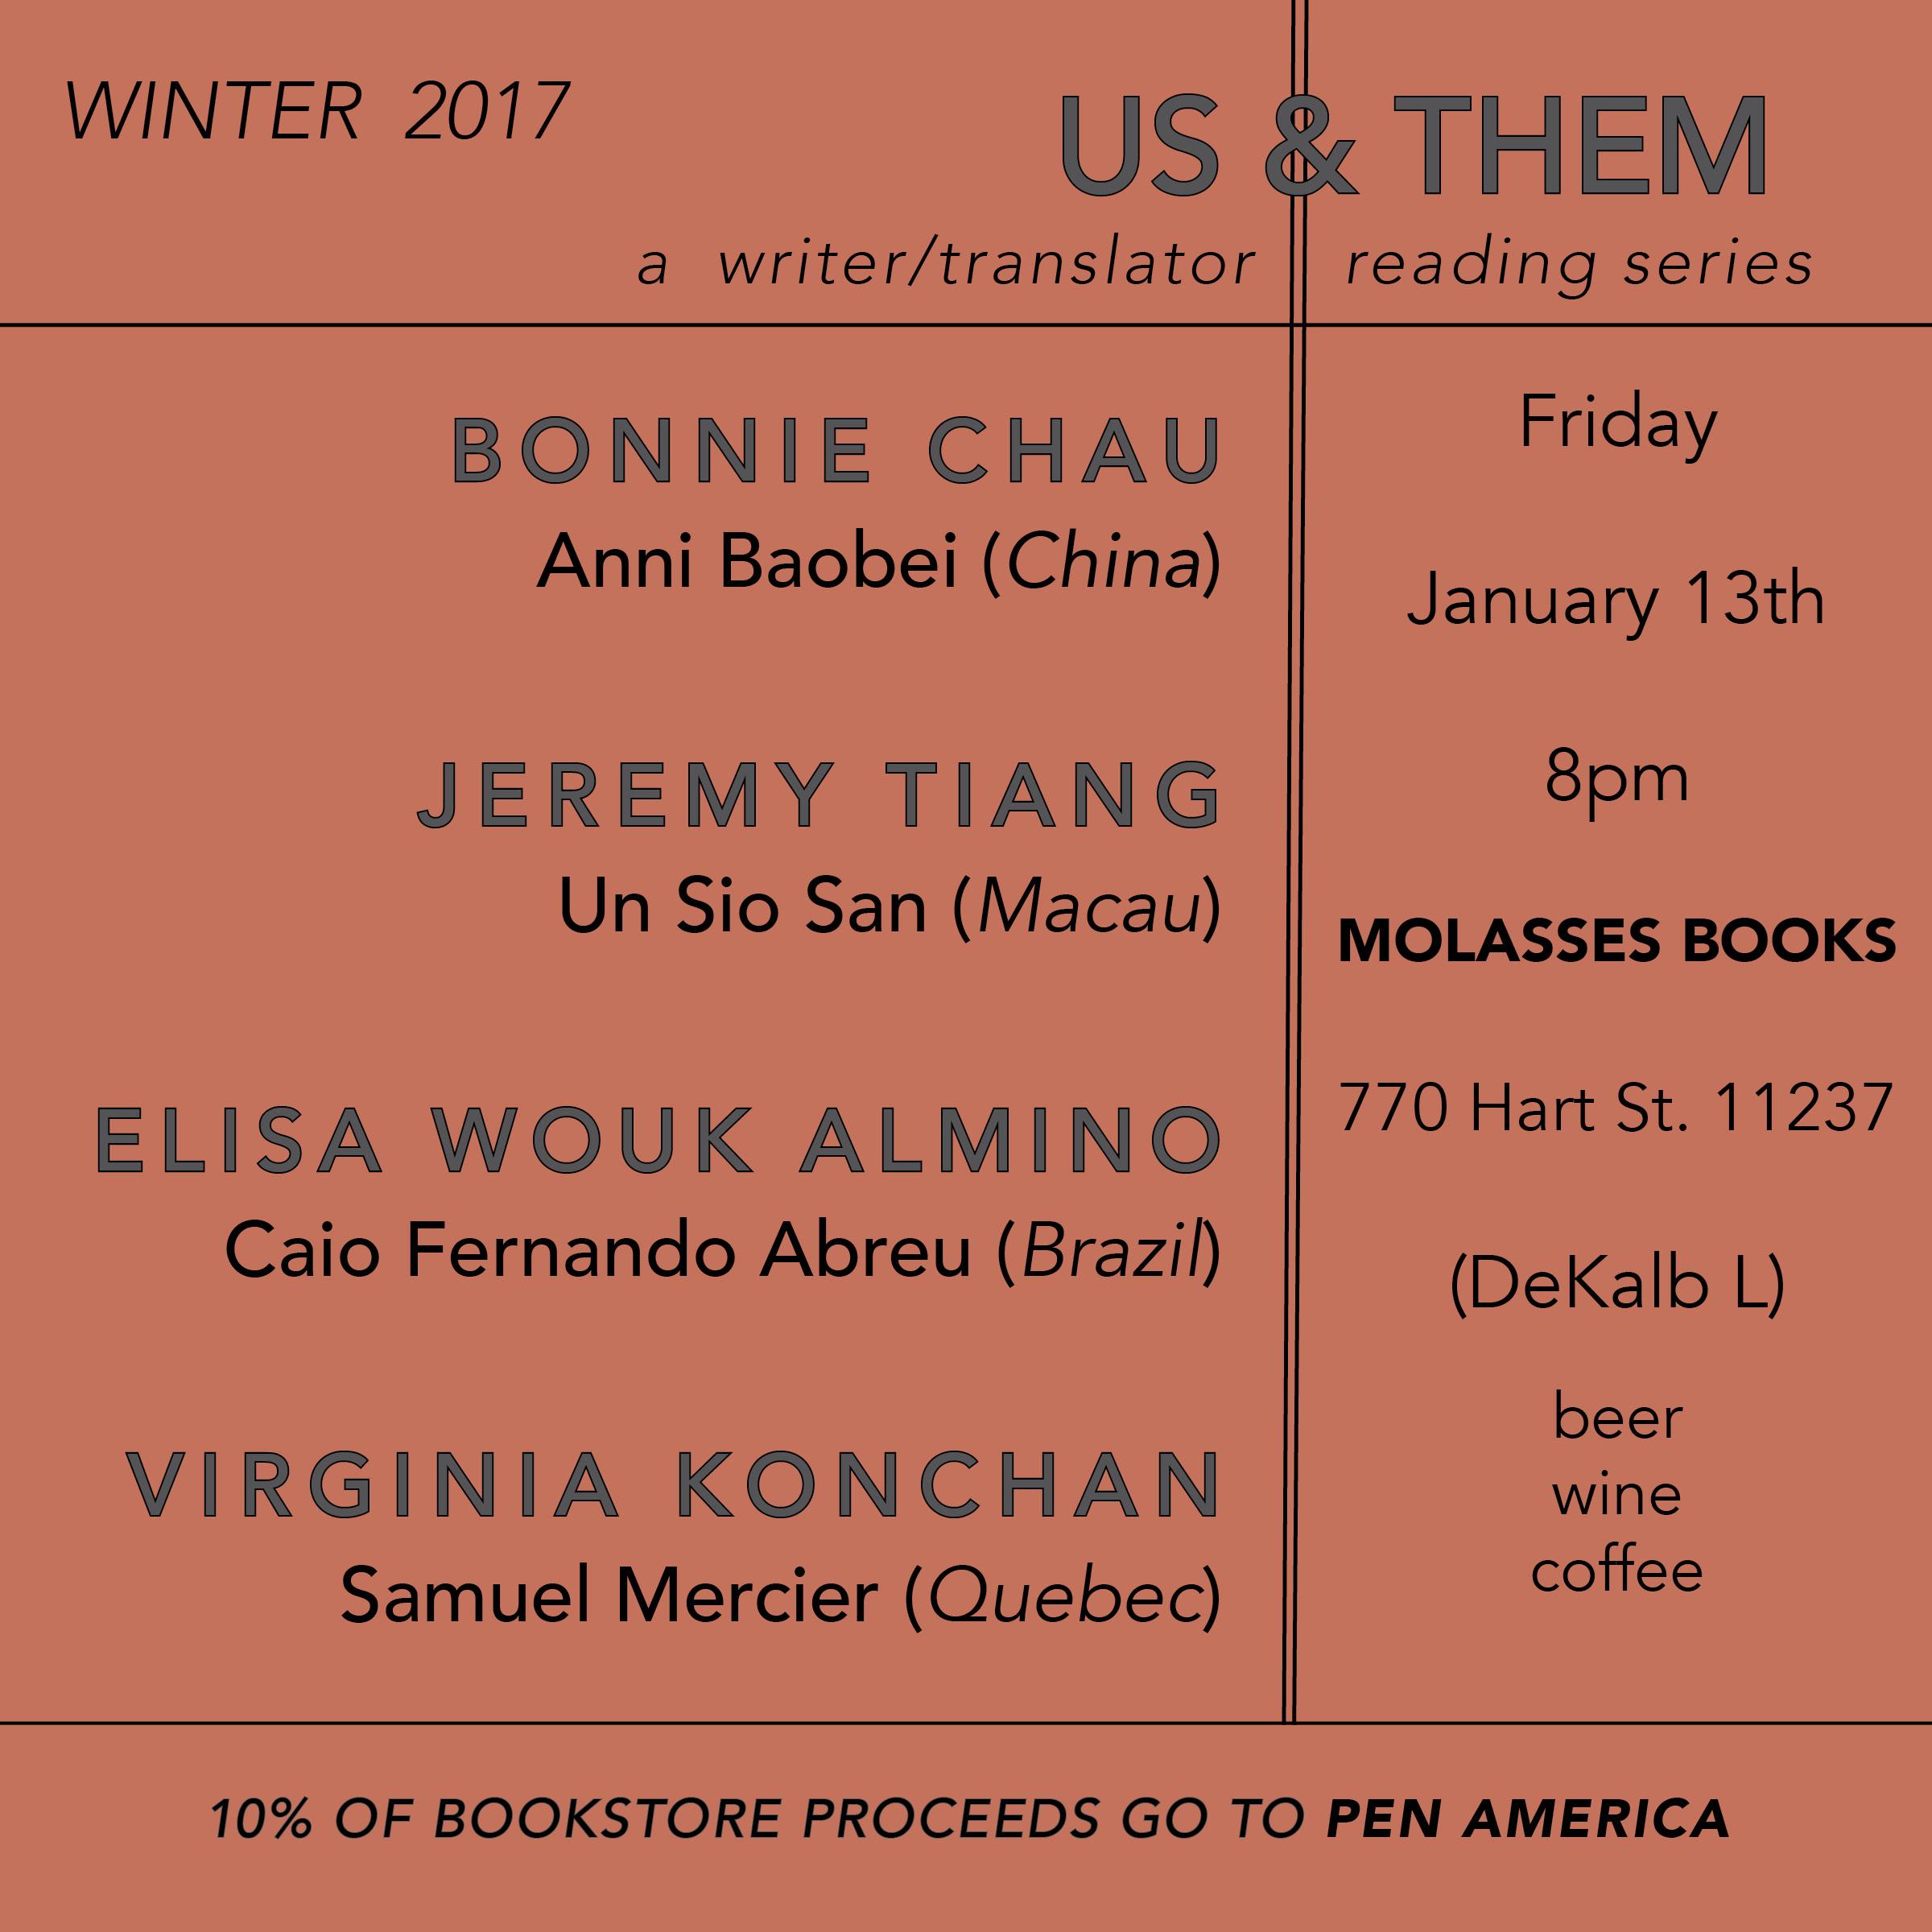 2017 Winter_Us&Them flyer_r3.jpg